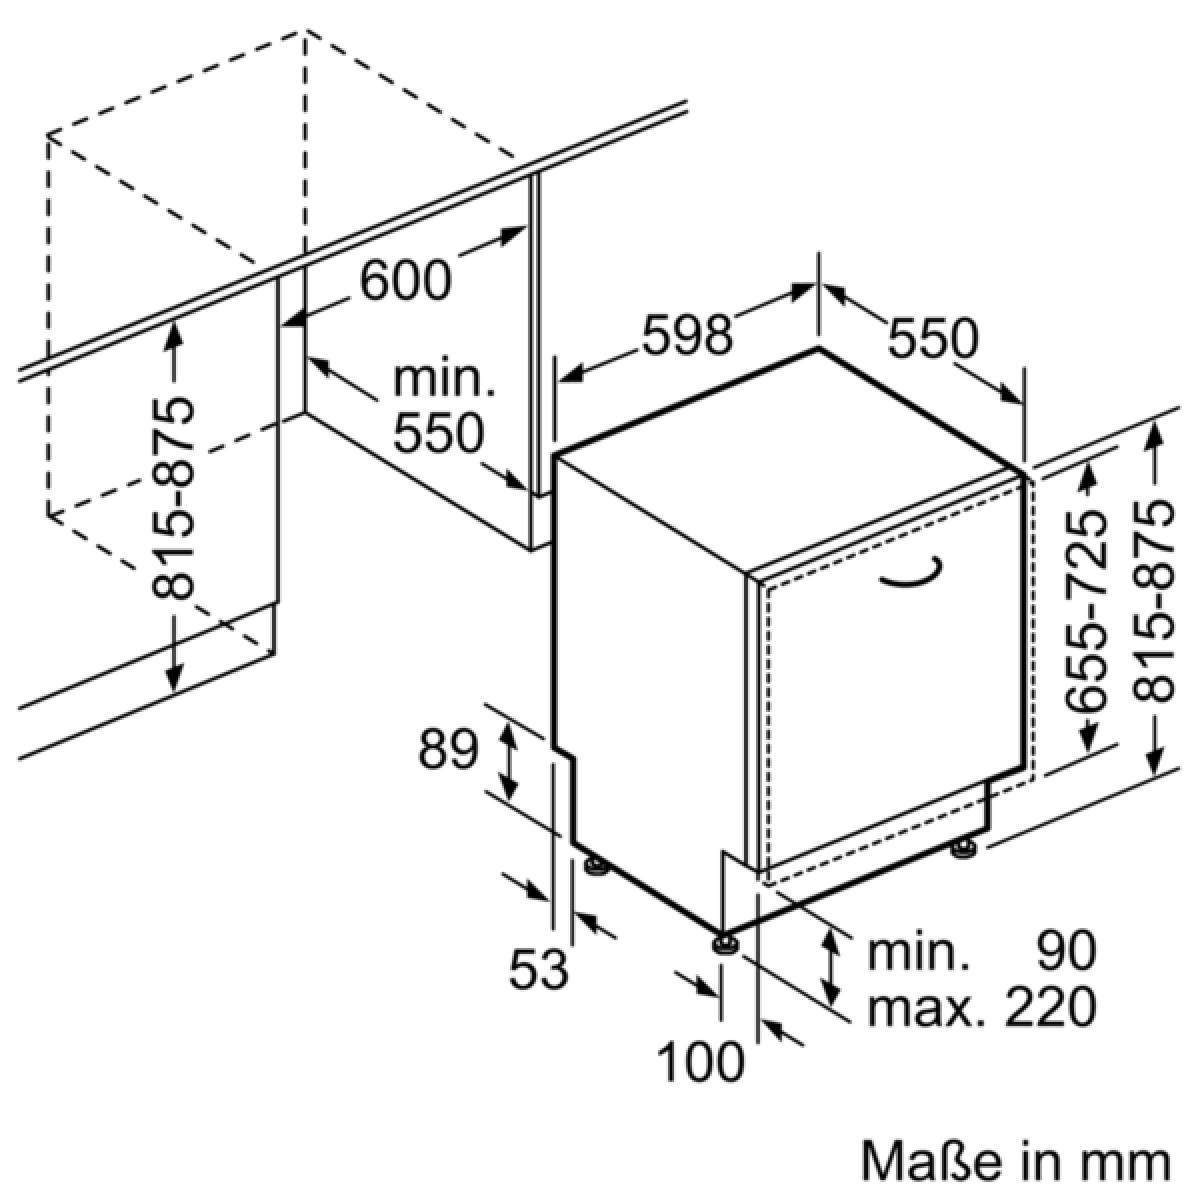 siemens sn636x00ce speedmatic gro raum geschirrsp ler 60 cm vollintegrierbar g nstig kaufen. Black Bedroom Furniture Sets. Home Design Ideas